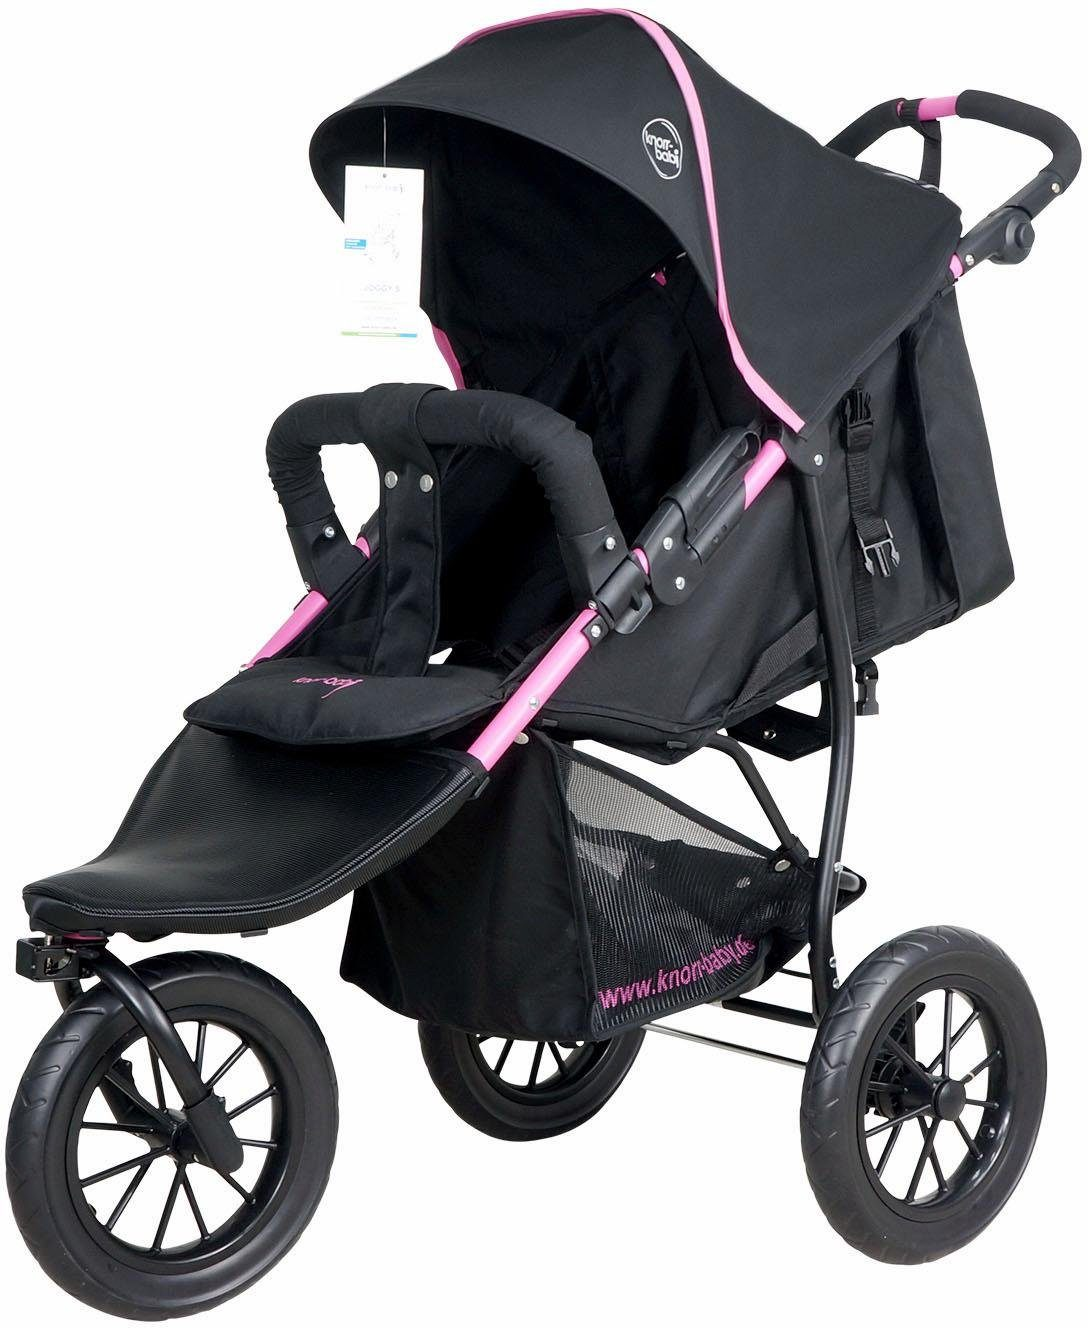 knorr-baby Jogger-Kinderwagen, »Joggy S, schwarz-fuchsia«